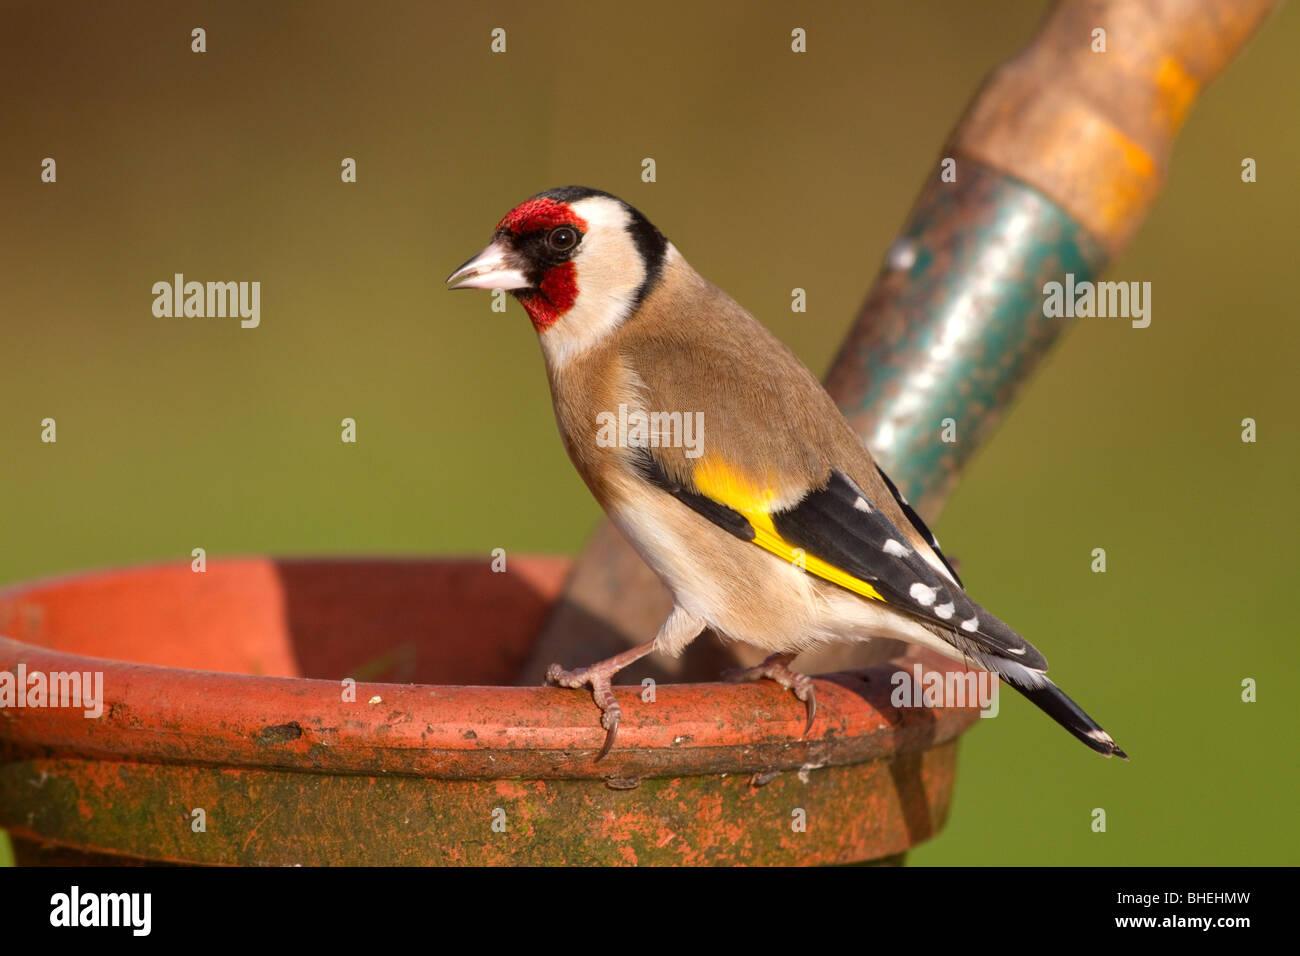 Goldfinch; Carduelis carduelis; on garden plant pot - Stock Image